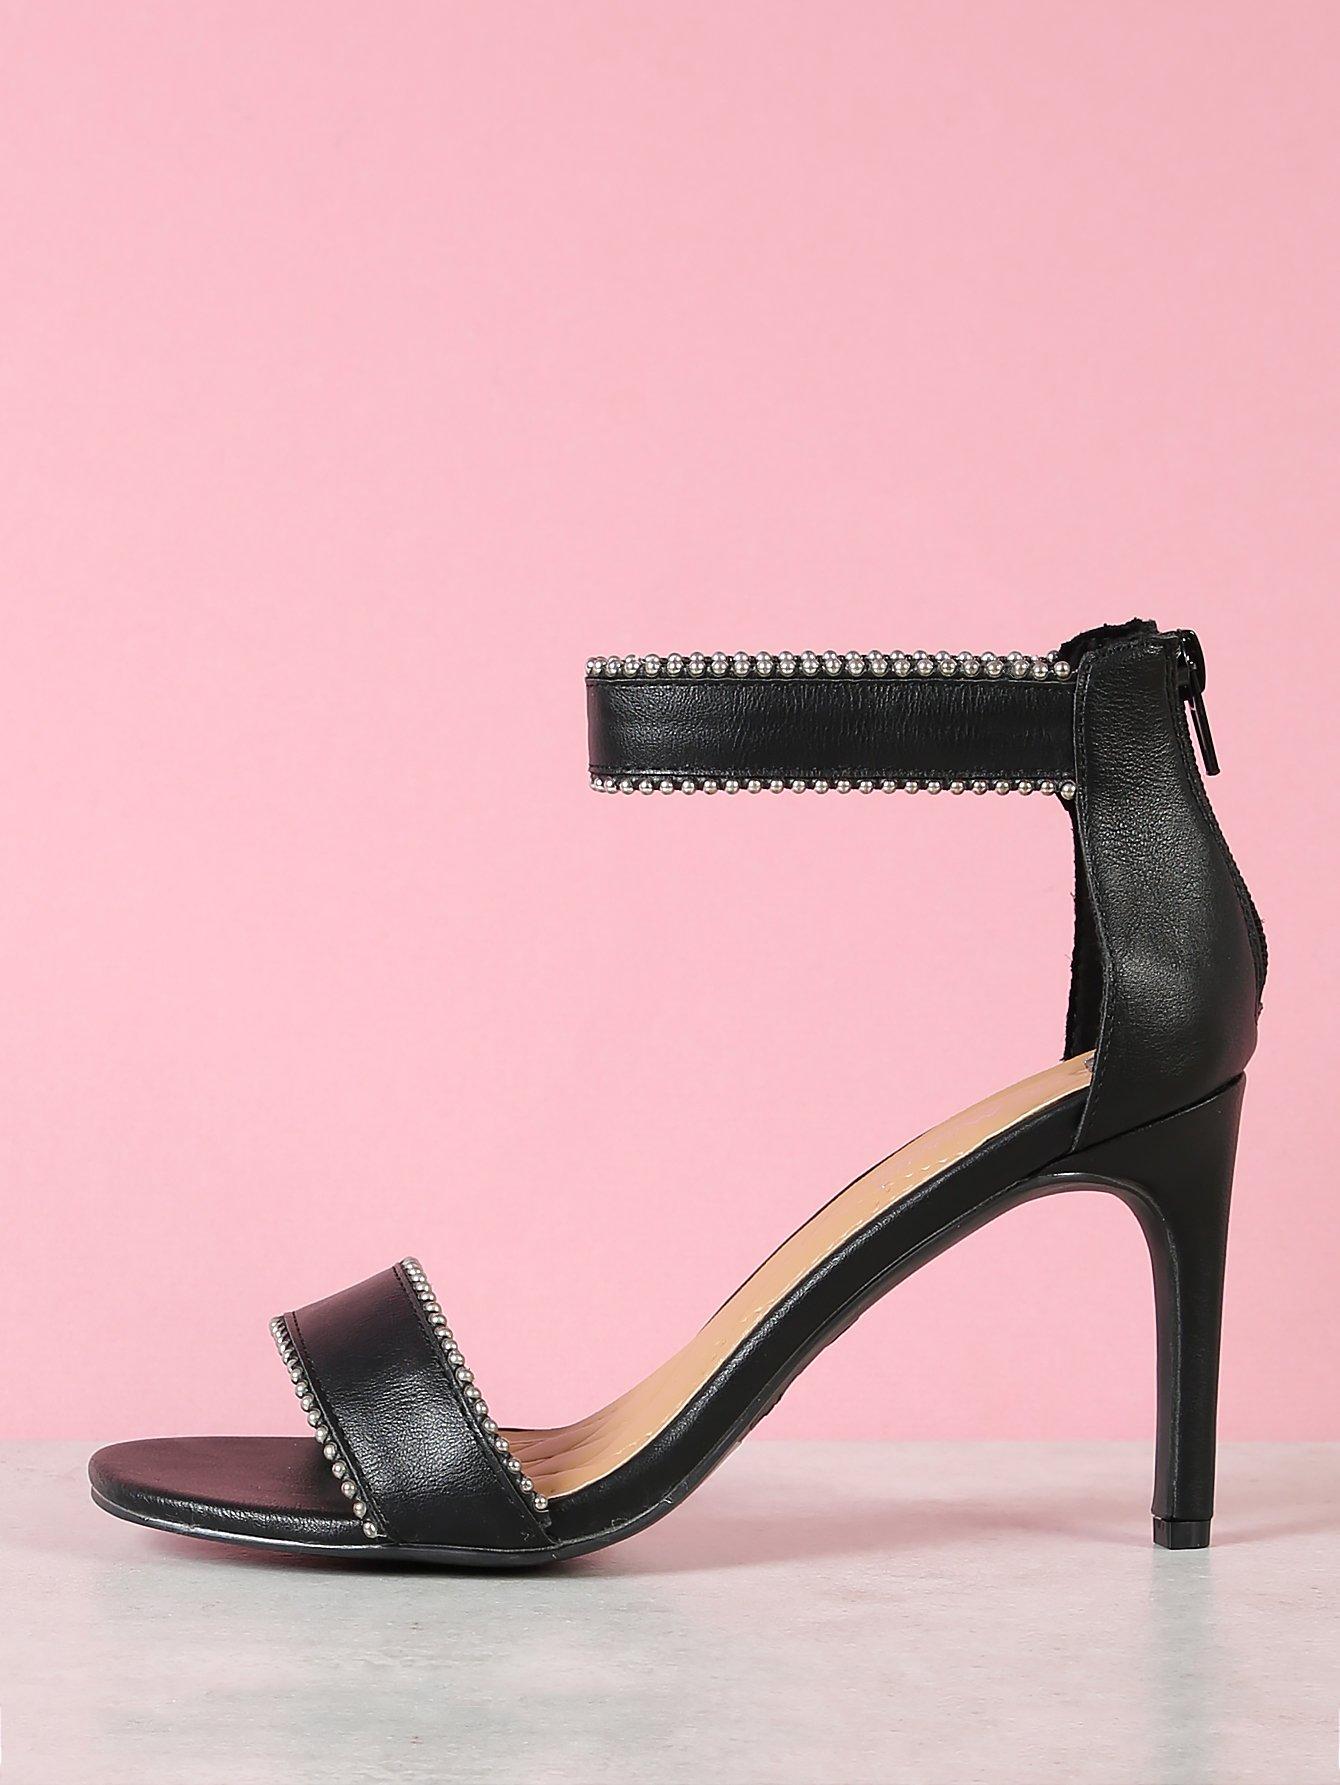 Beaded Ankle Strap Open Toe Single Sole Heels mix color causal wedge high heels women sandals platform ladies shoes open toe ankle strap womens heels size 11 women heels